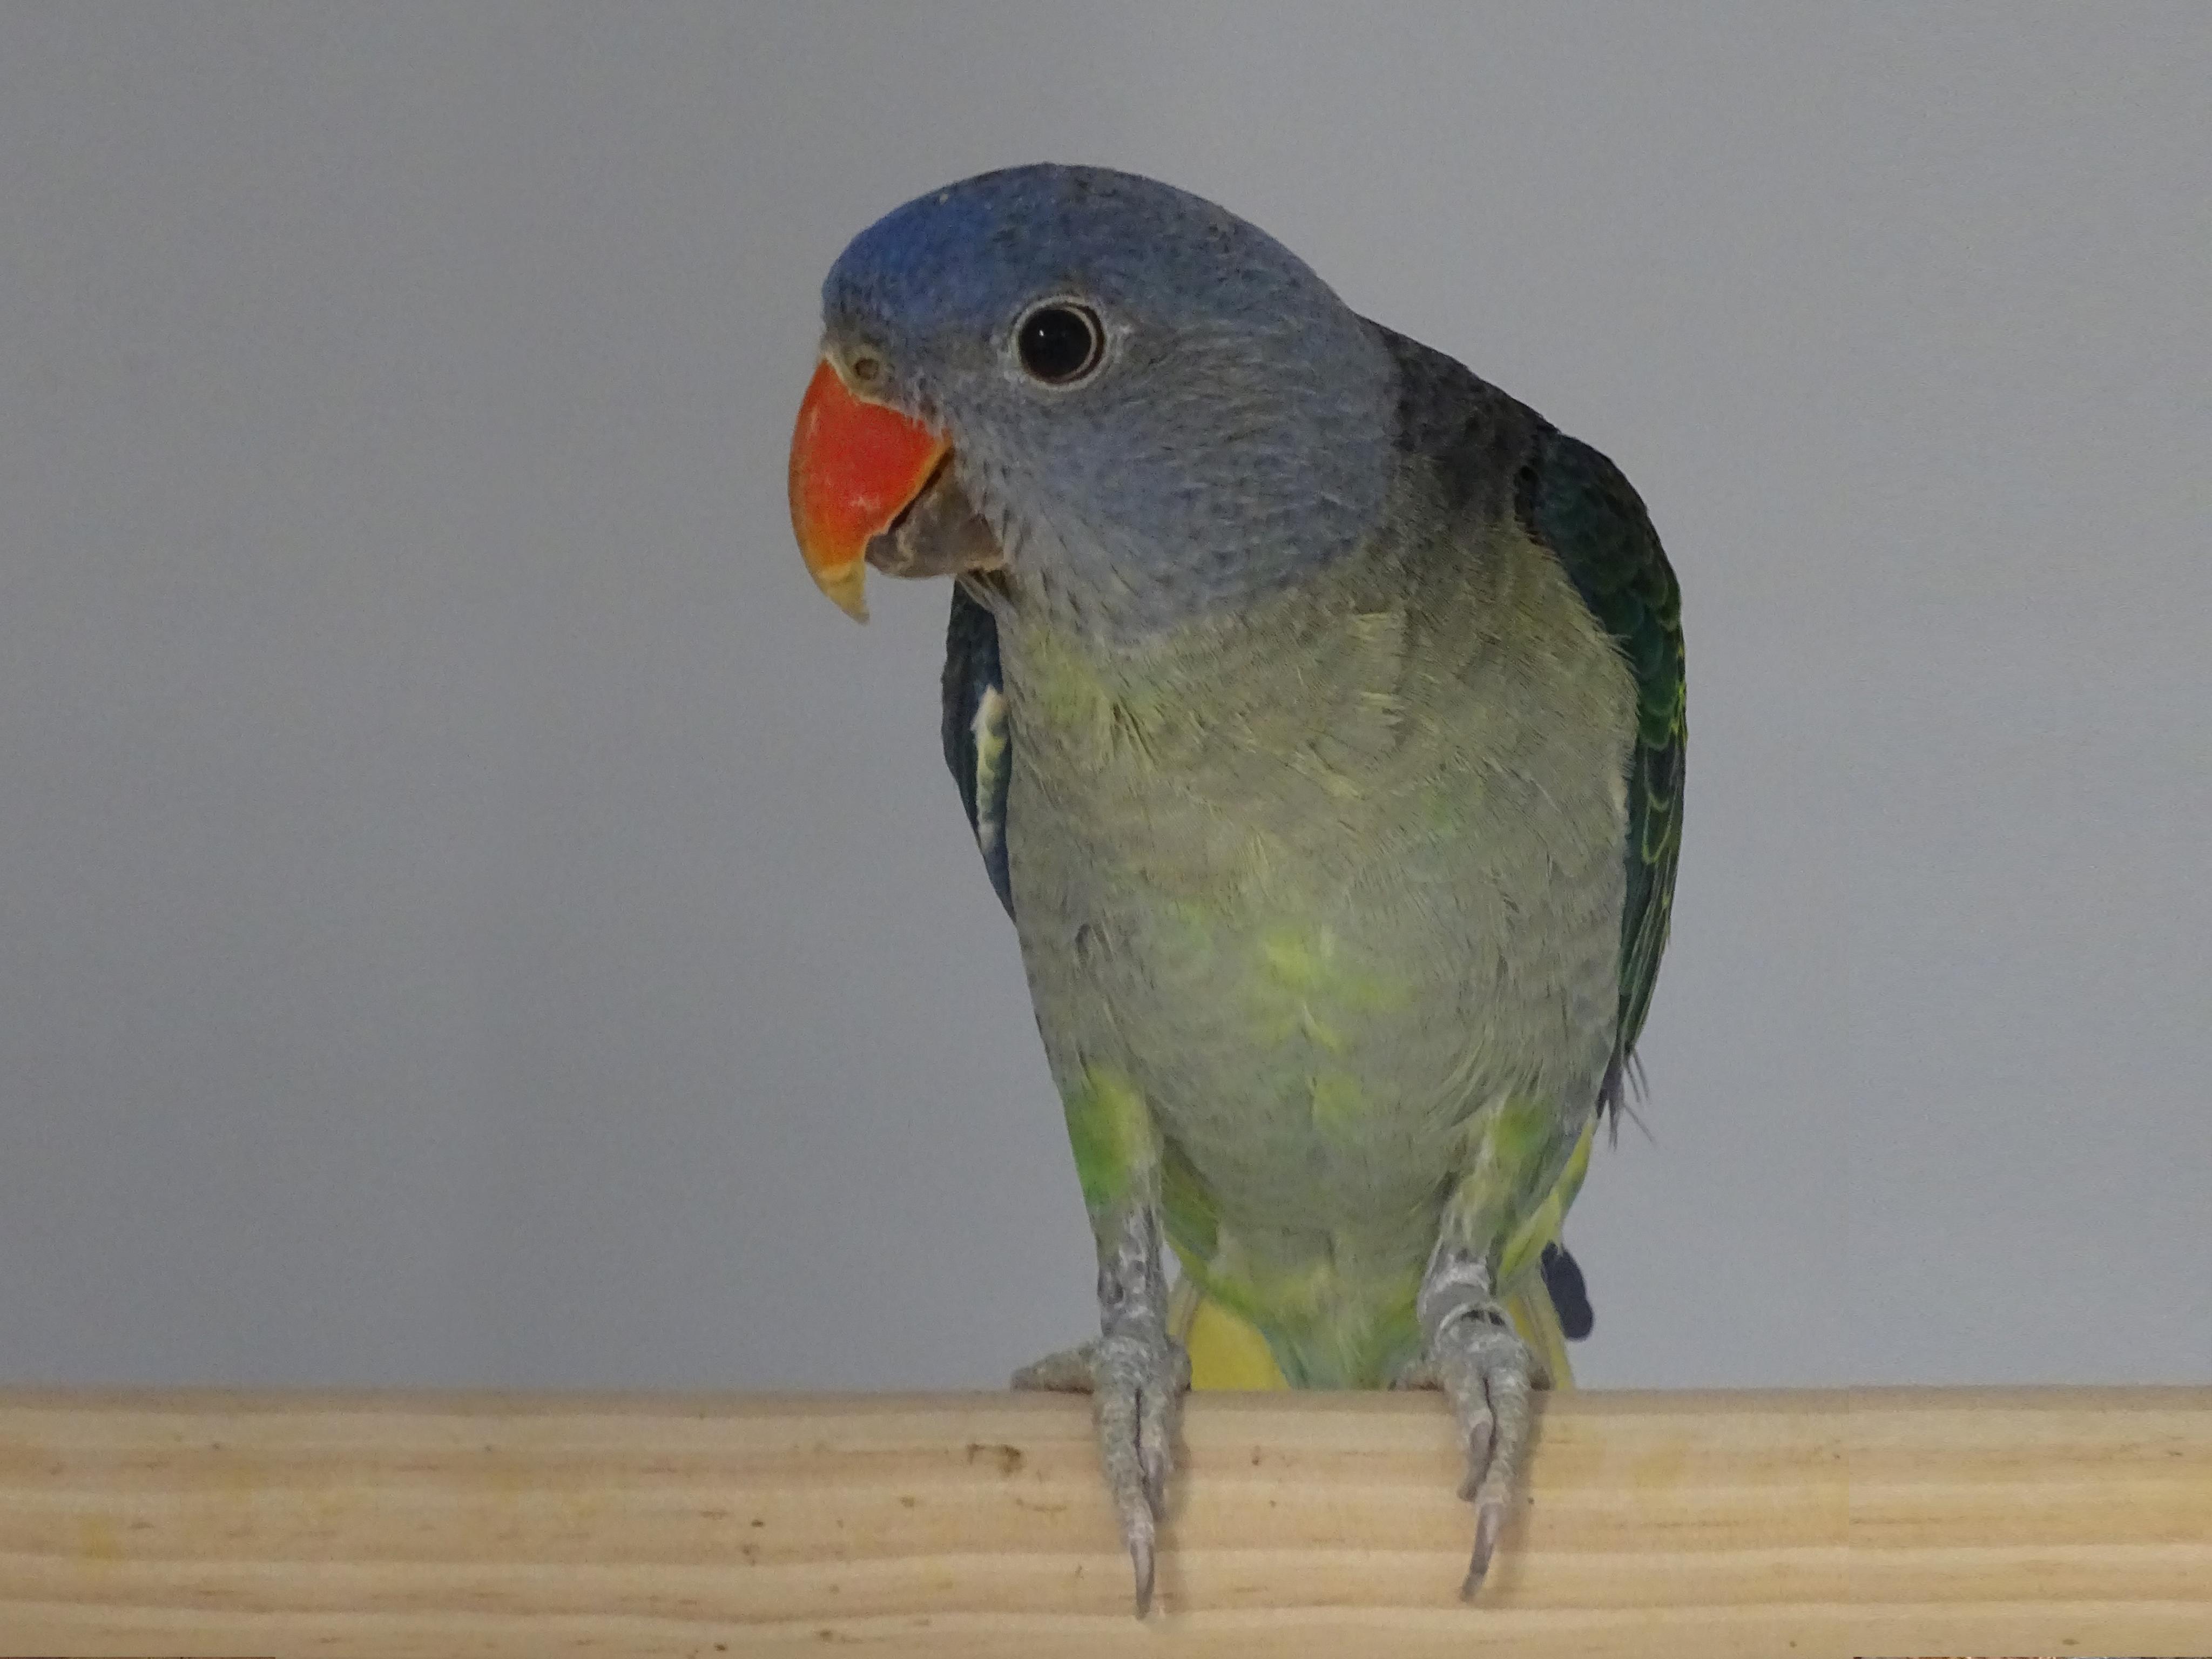 Blue rumped parrot male Psittinus cyanurus